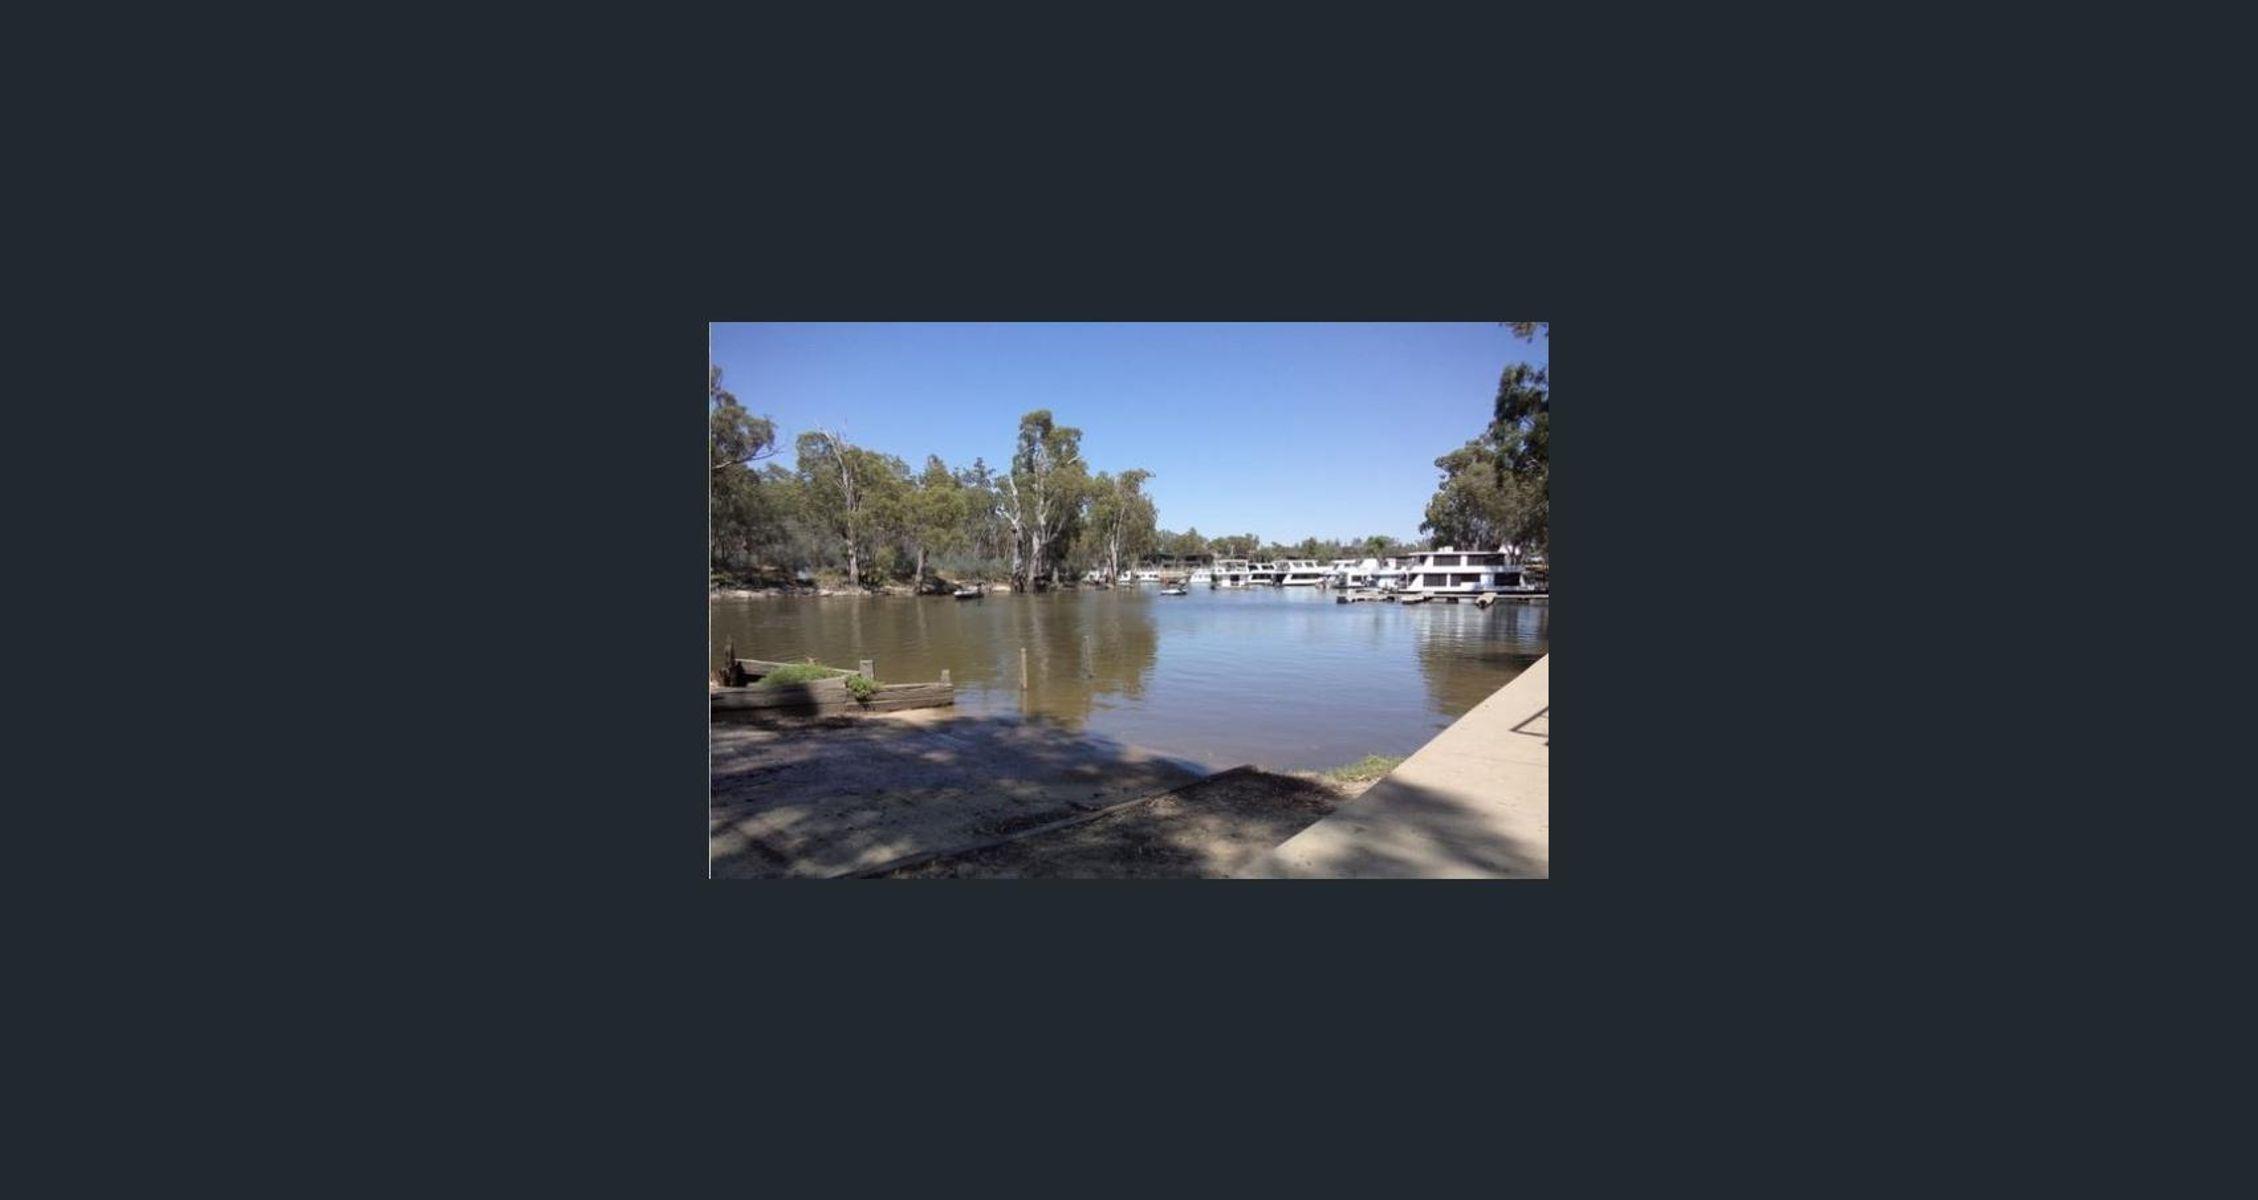 Lot 19/1771 Perricoota Road, Moama, NSW 2731